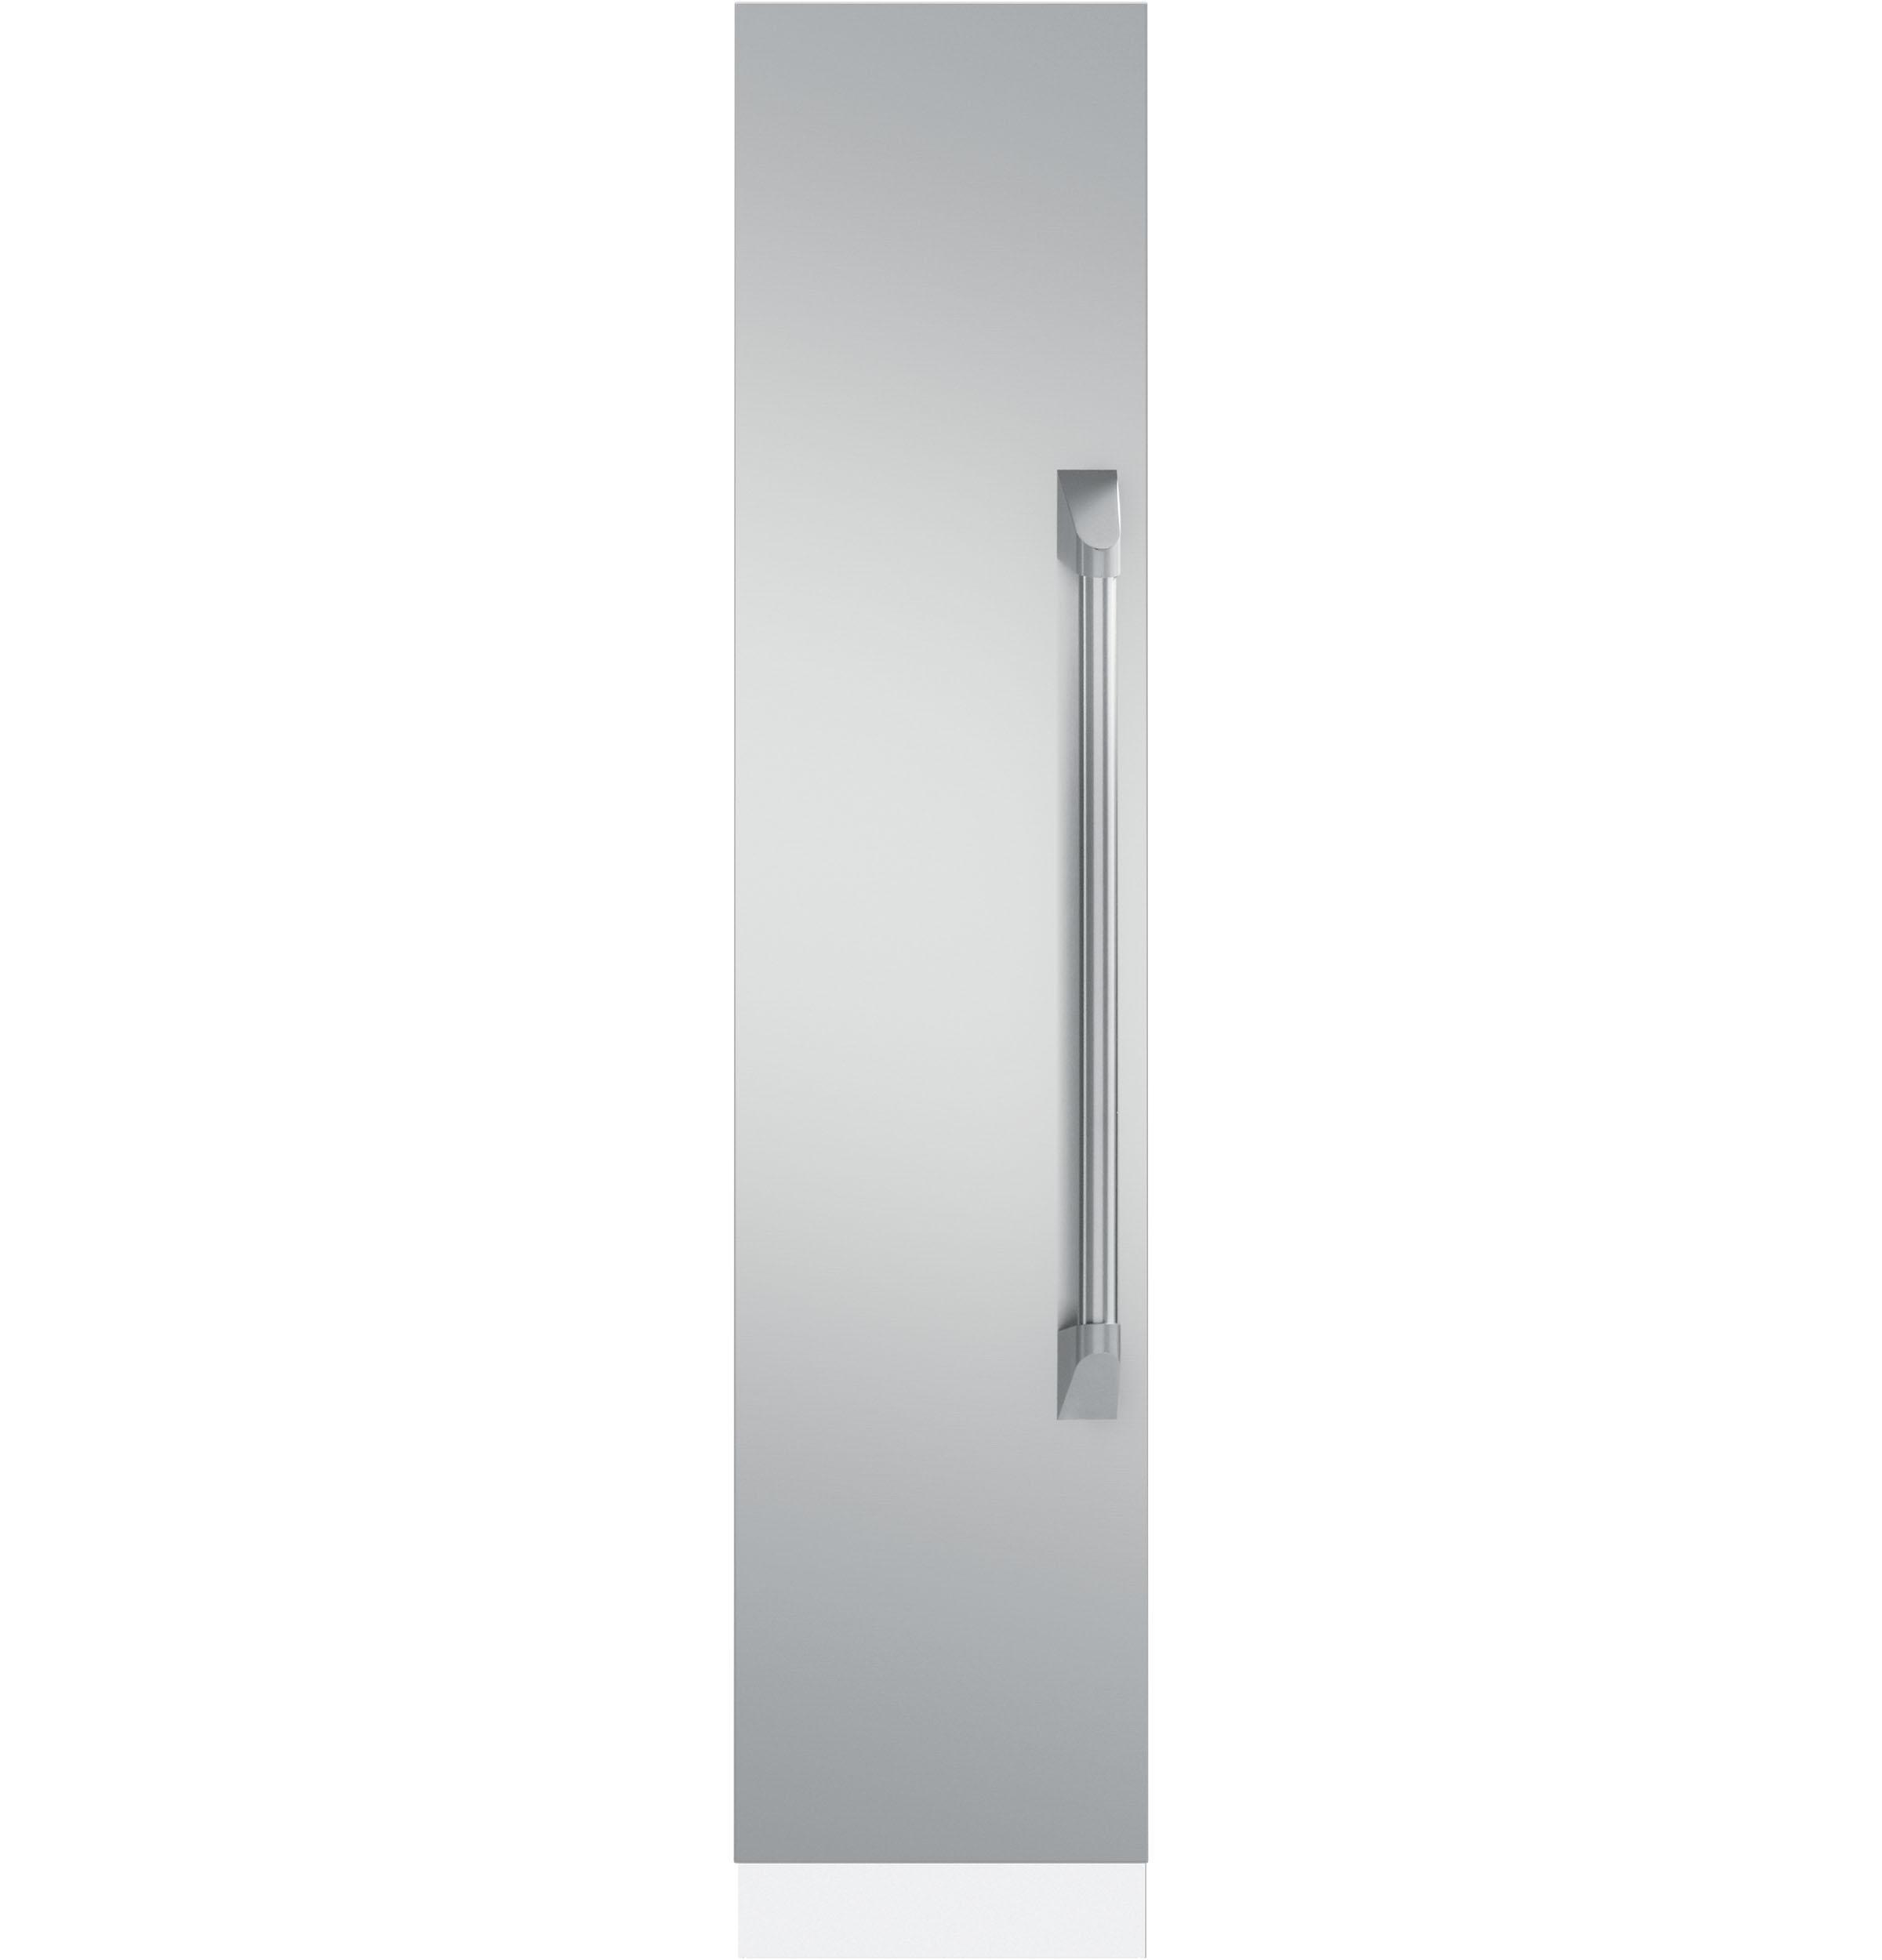 Zkcsp184 Monogram Zkcsp184 Refrigeration Accessories